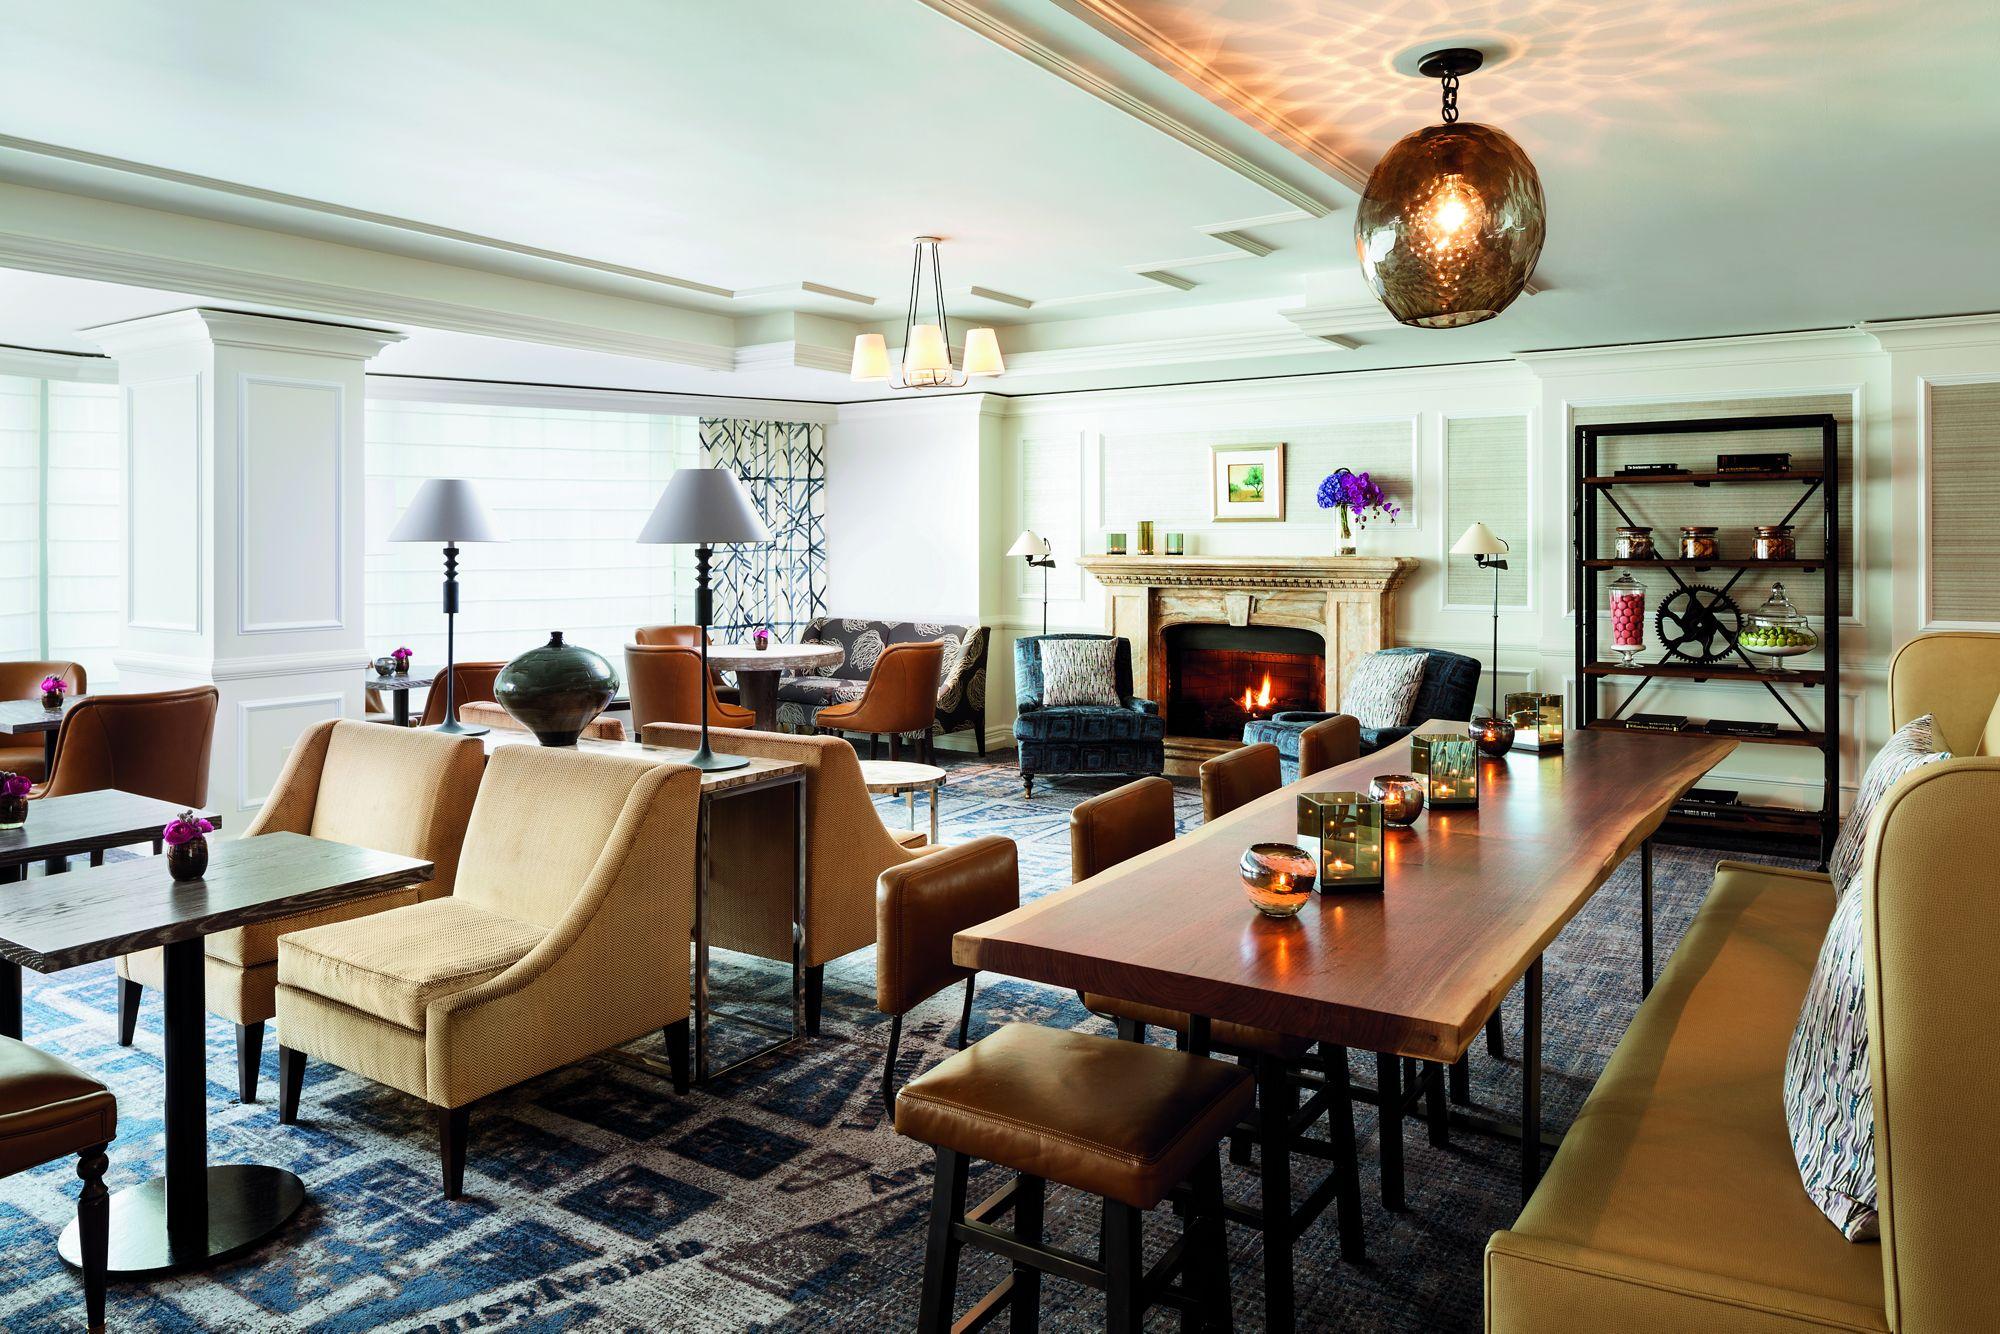 Ritz-Carlton Residences Washington, D.C. for Sale and Lease